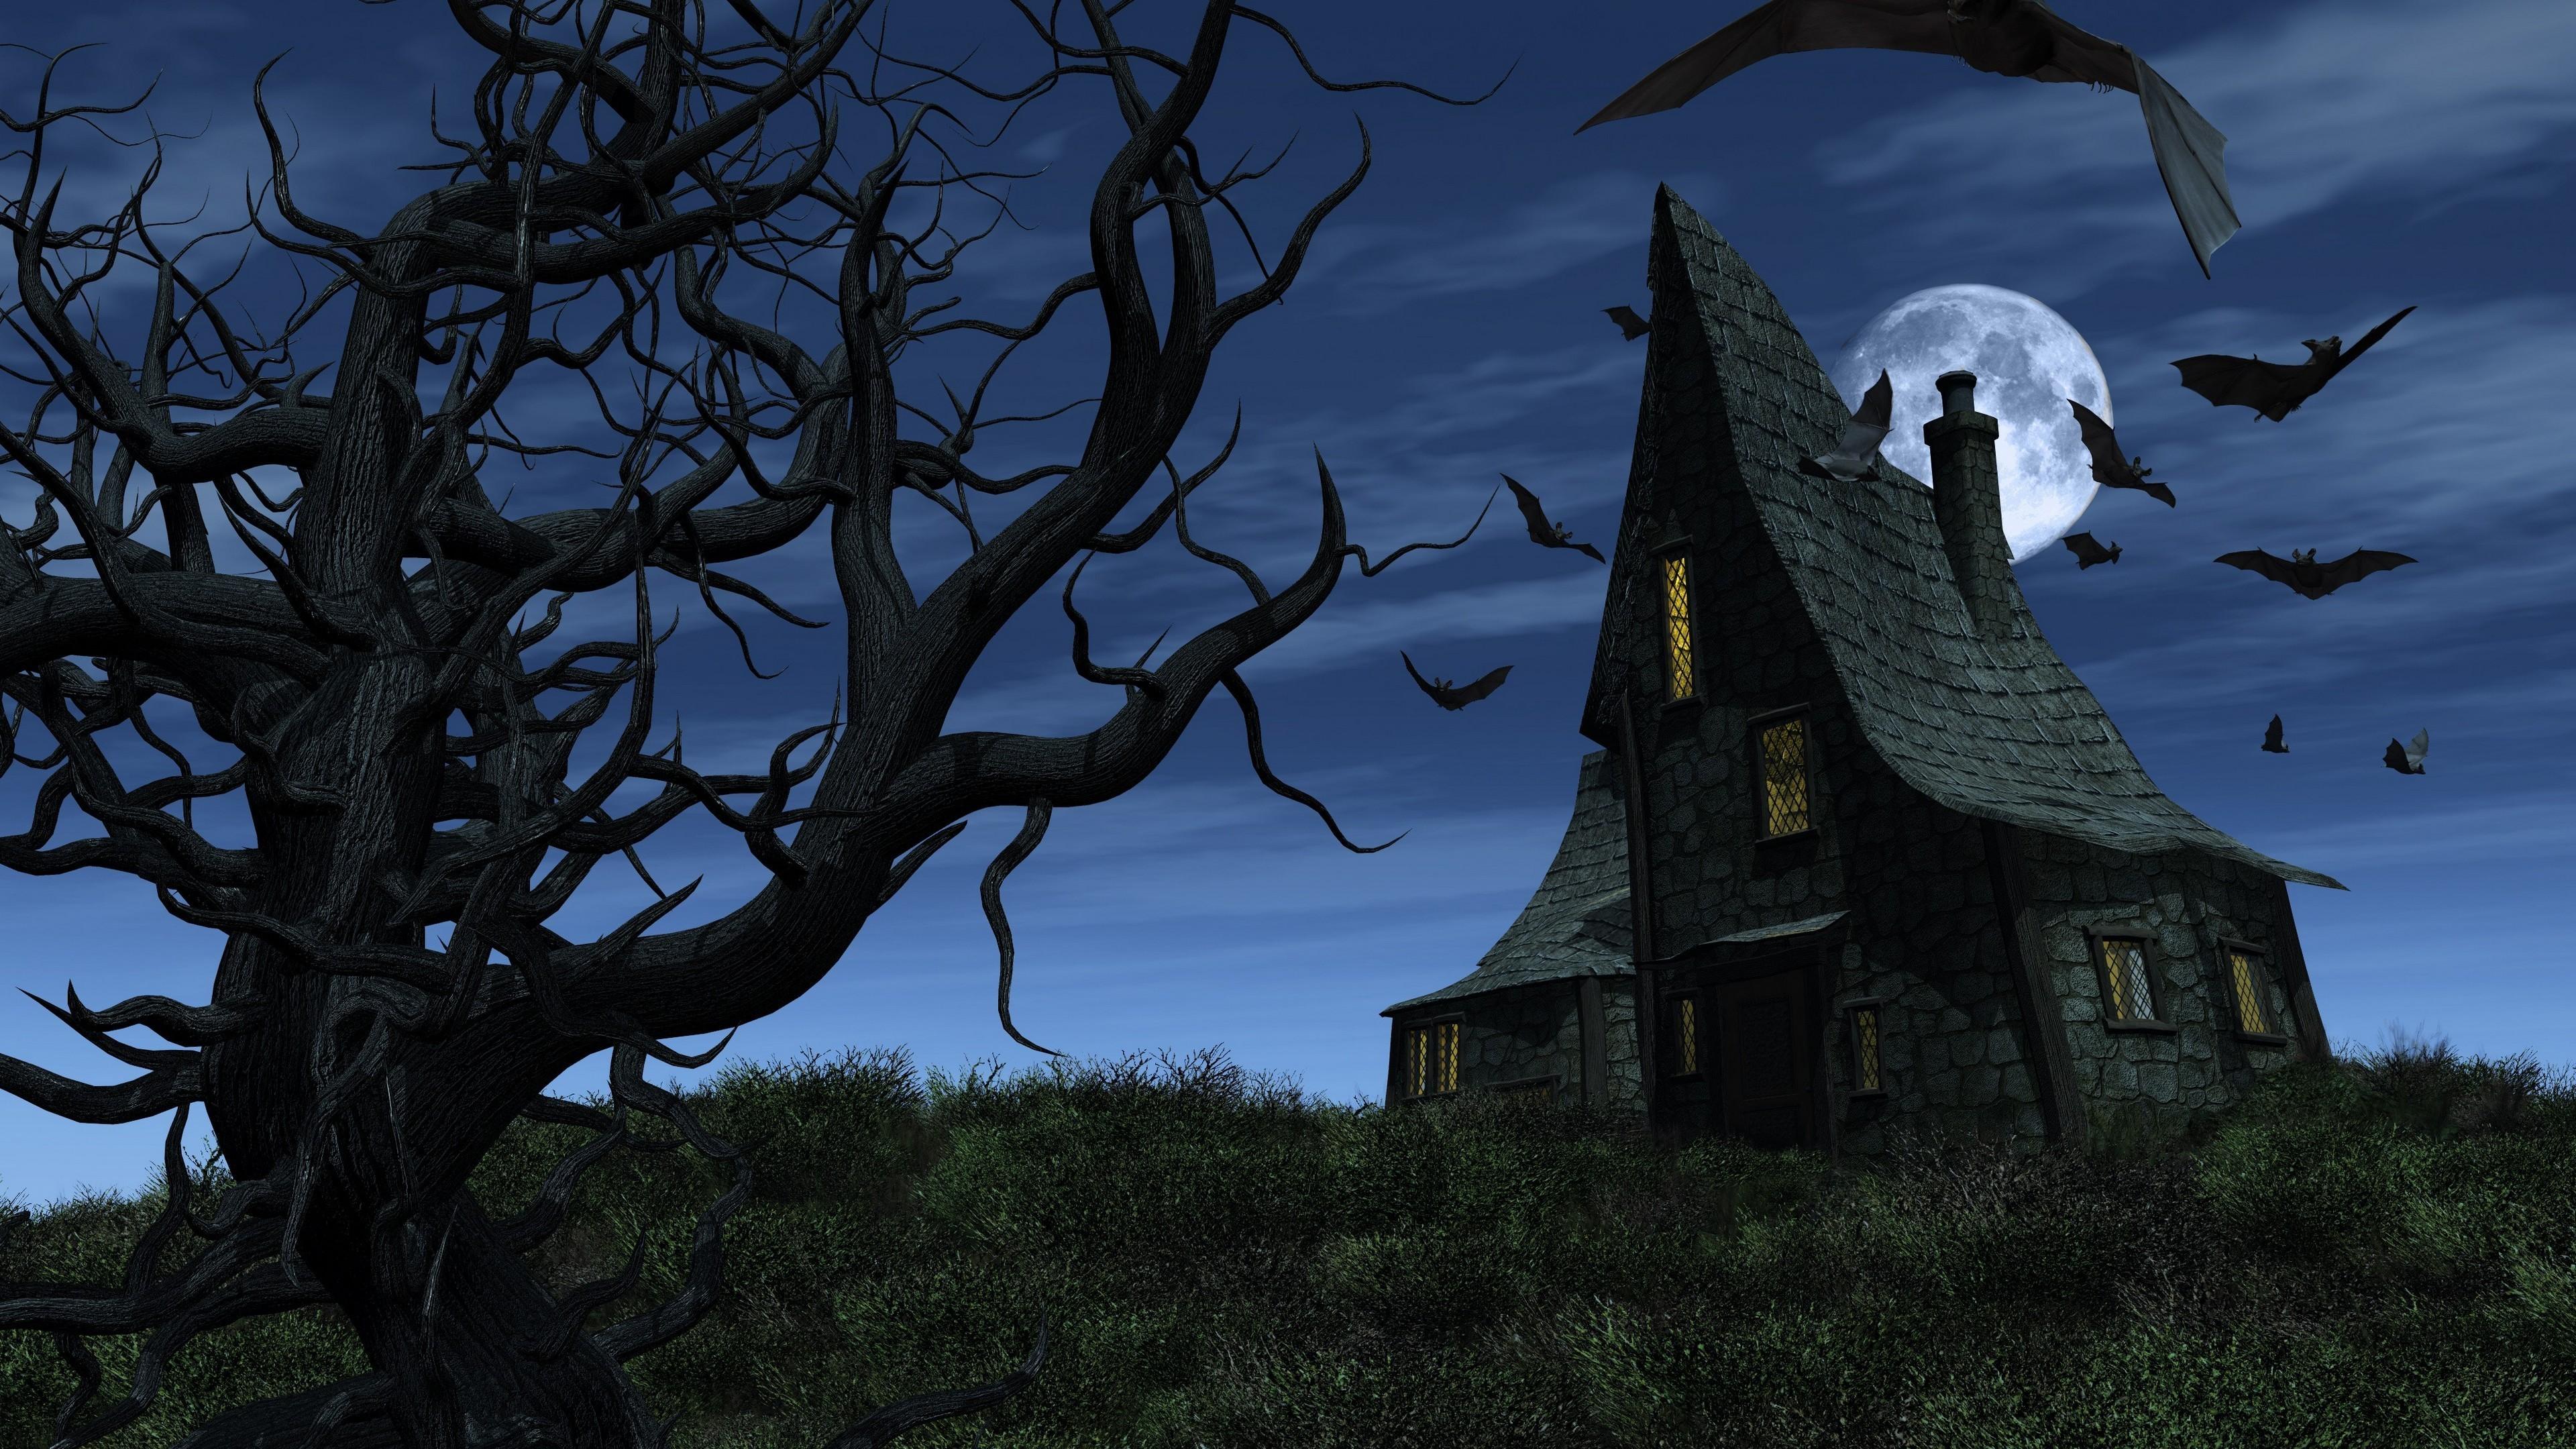 Haunted House Background (55+ images)